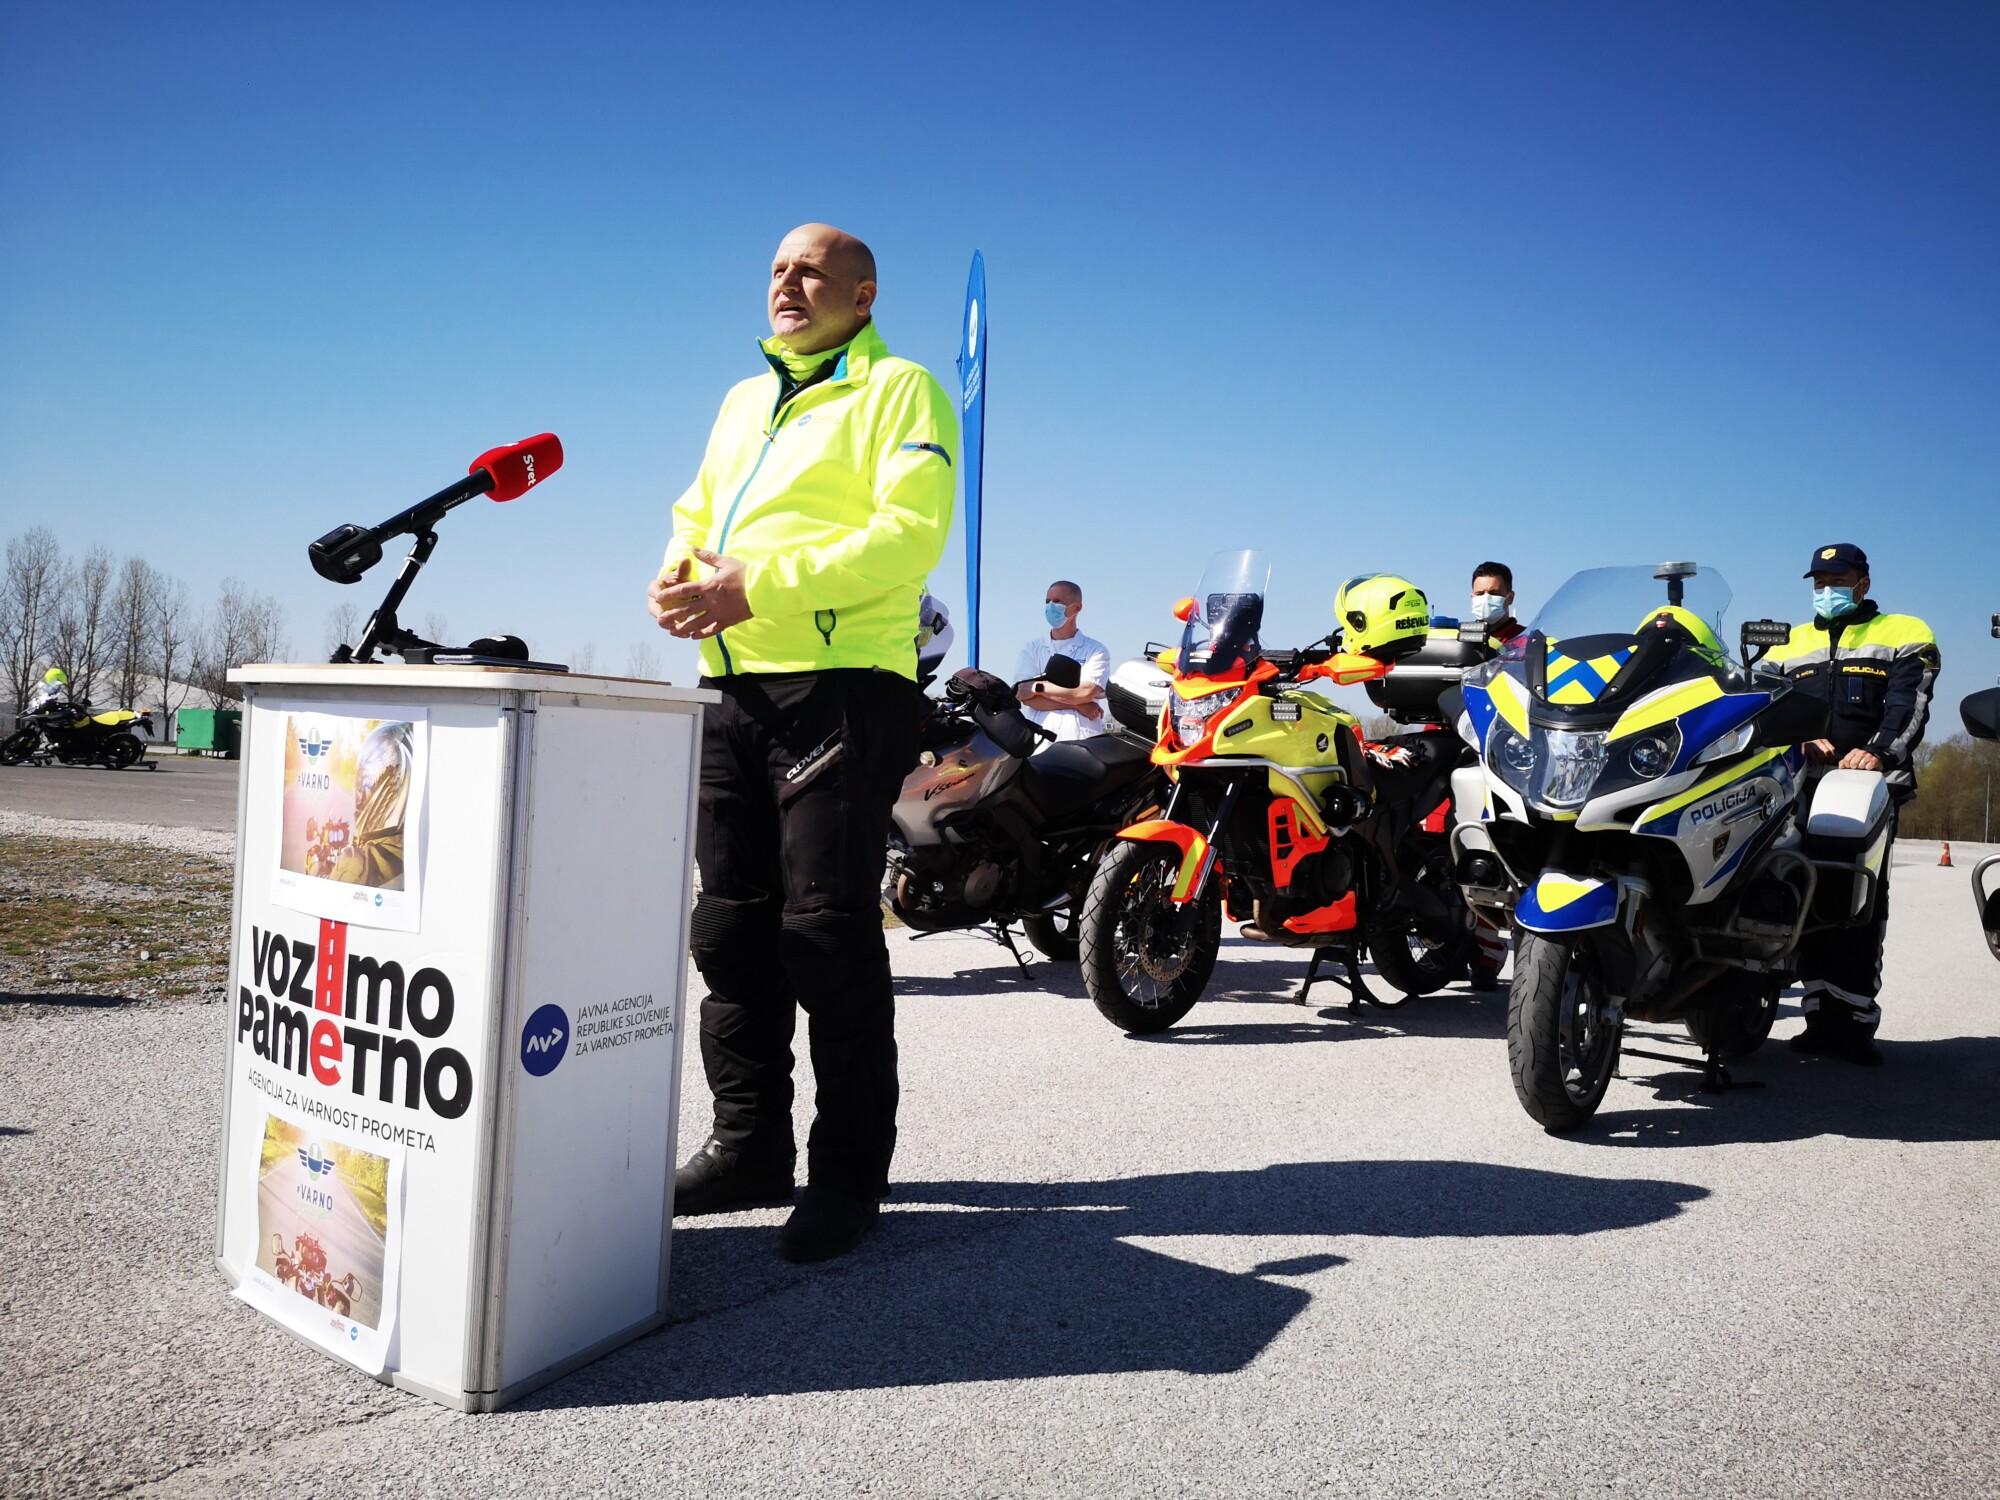 Igor Mihajlik, Agencija za varnost prometa